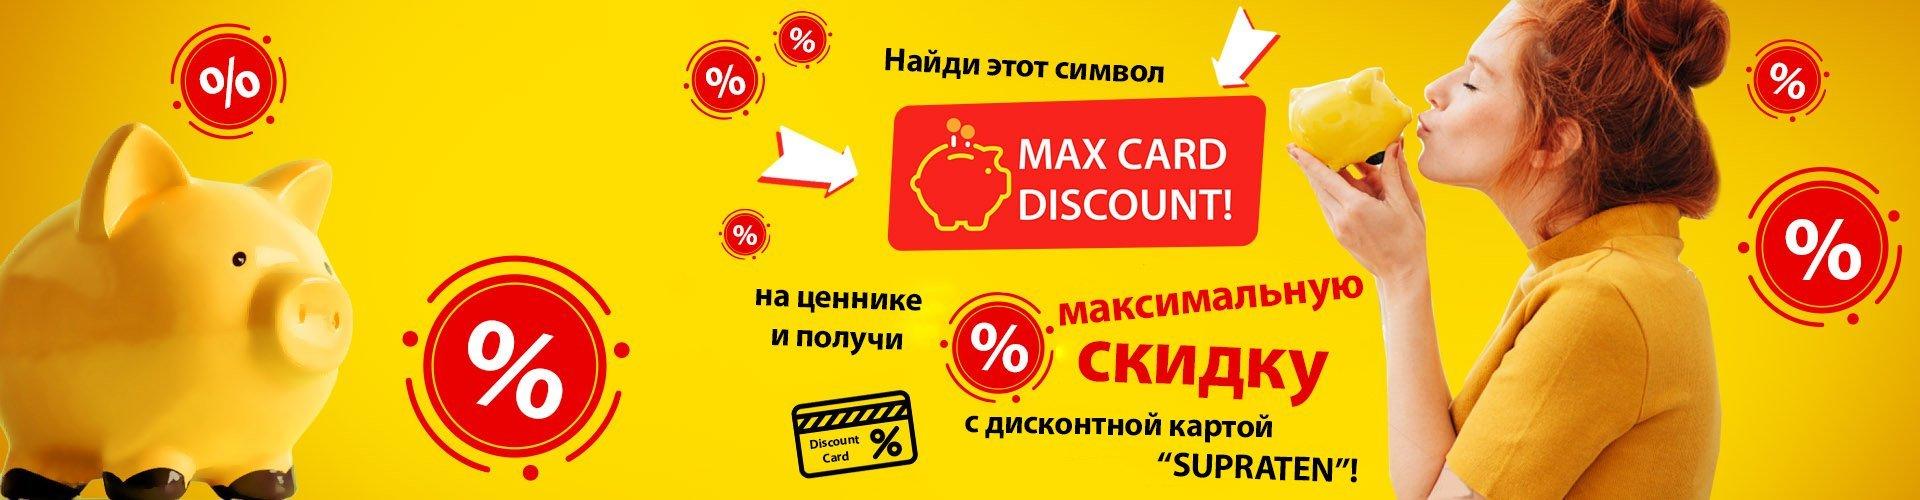 Max Card Discount